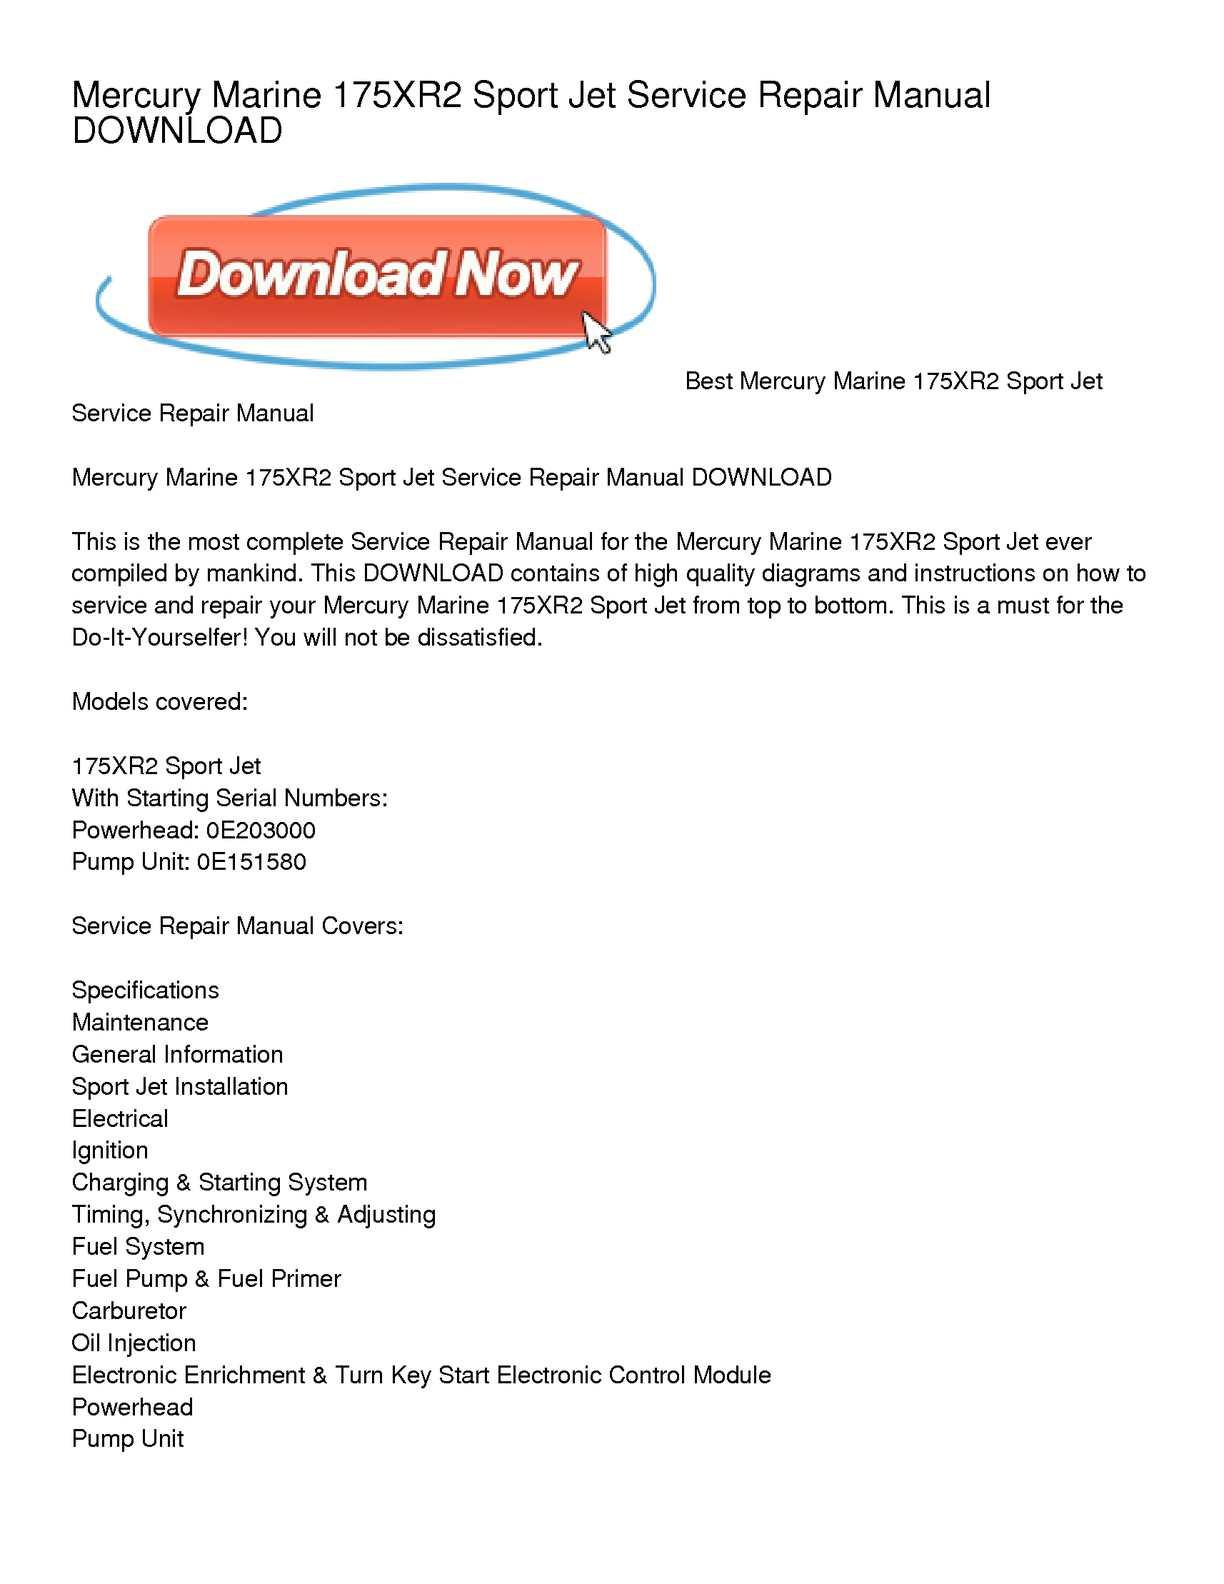 calam o mercury marine 175xr2 sport jet service repair manual download rh calameo com mercury sport jet service manual mercury 240 sport jet service manual